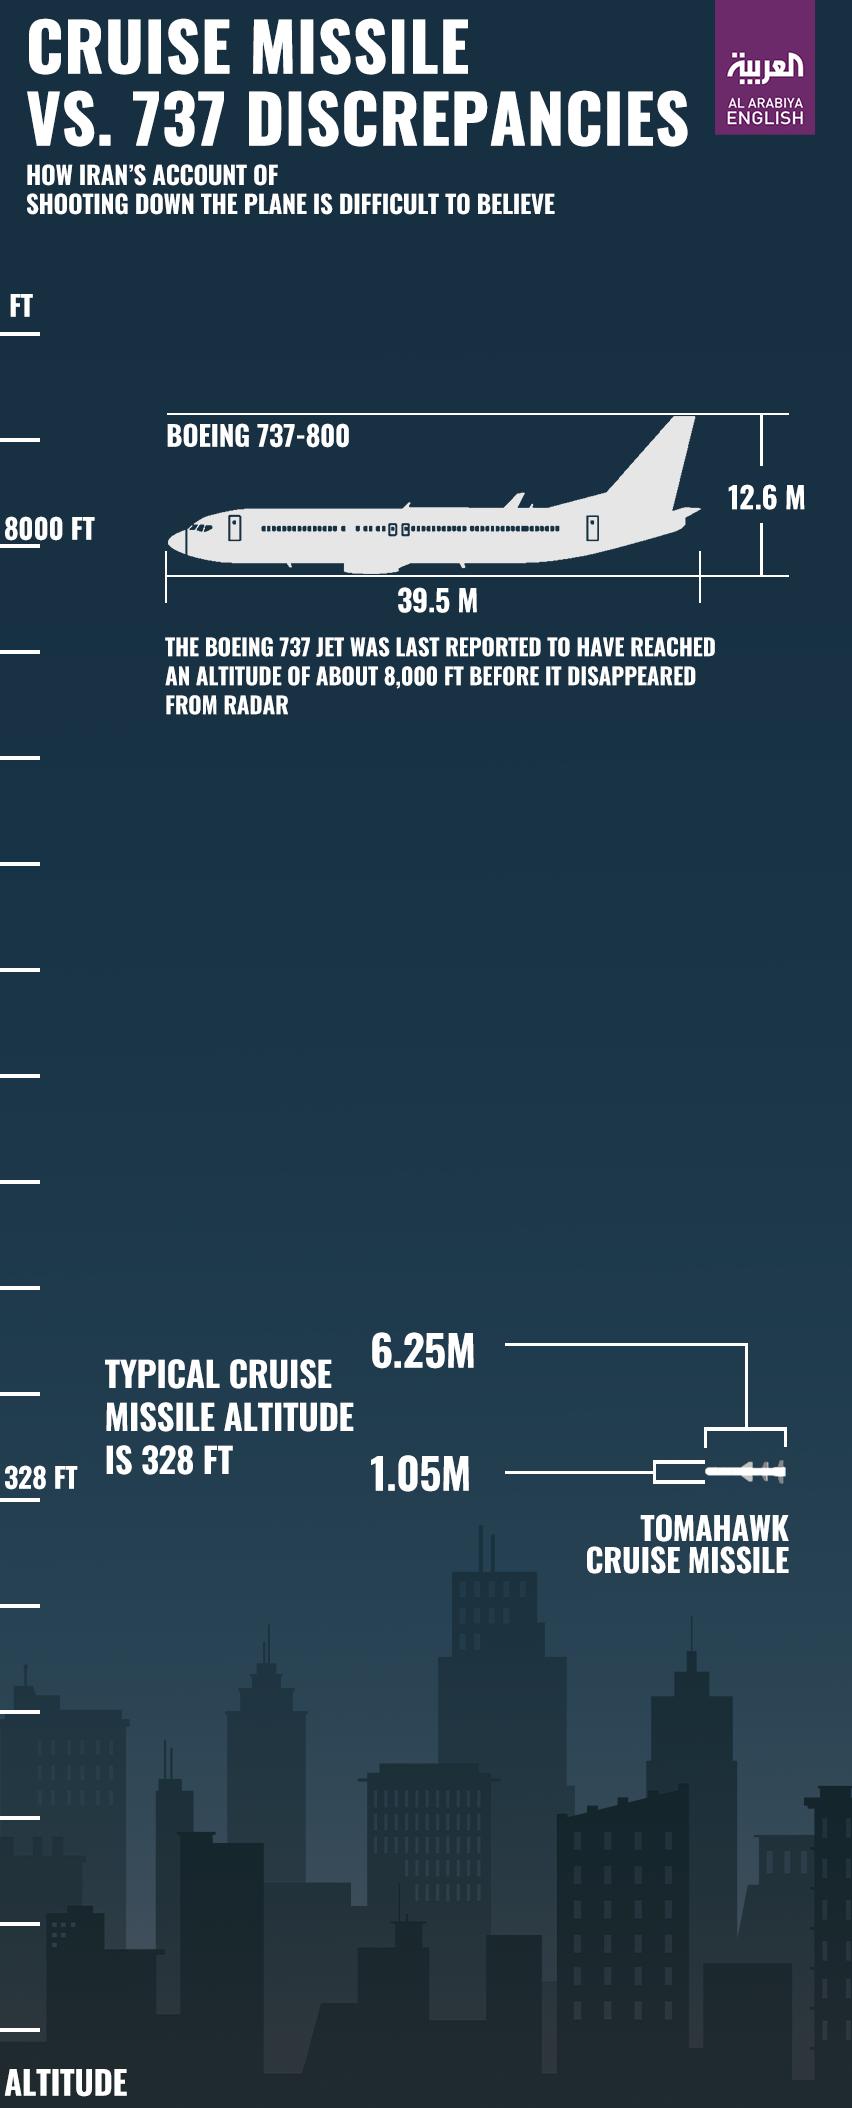 Ukraine Plane Missile - Infographic